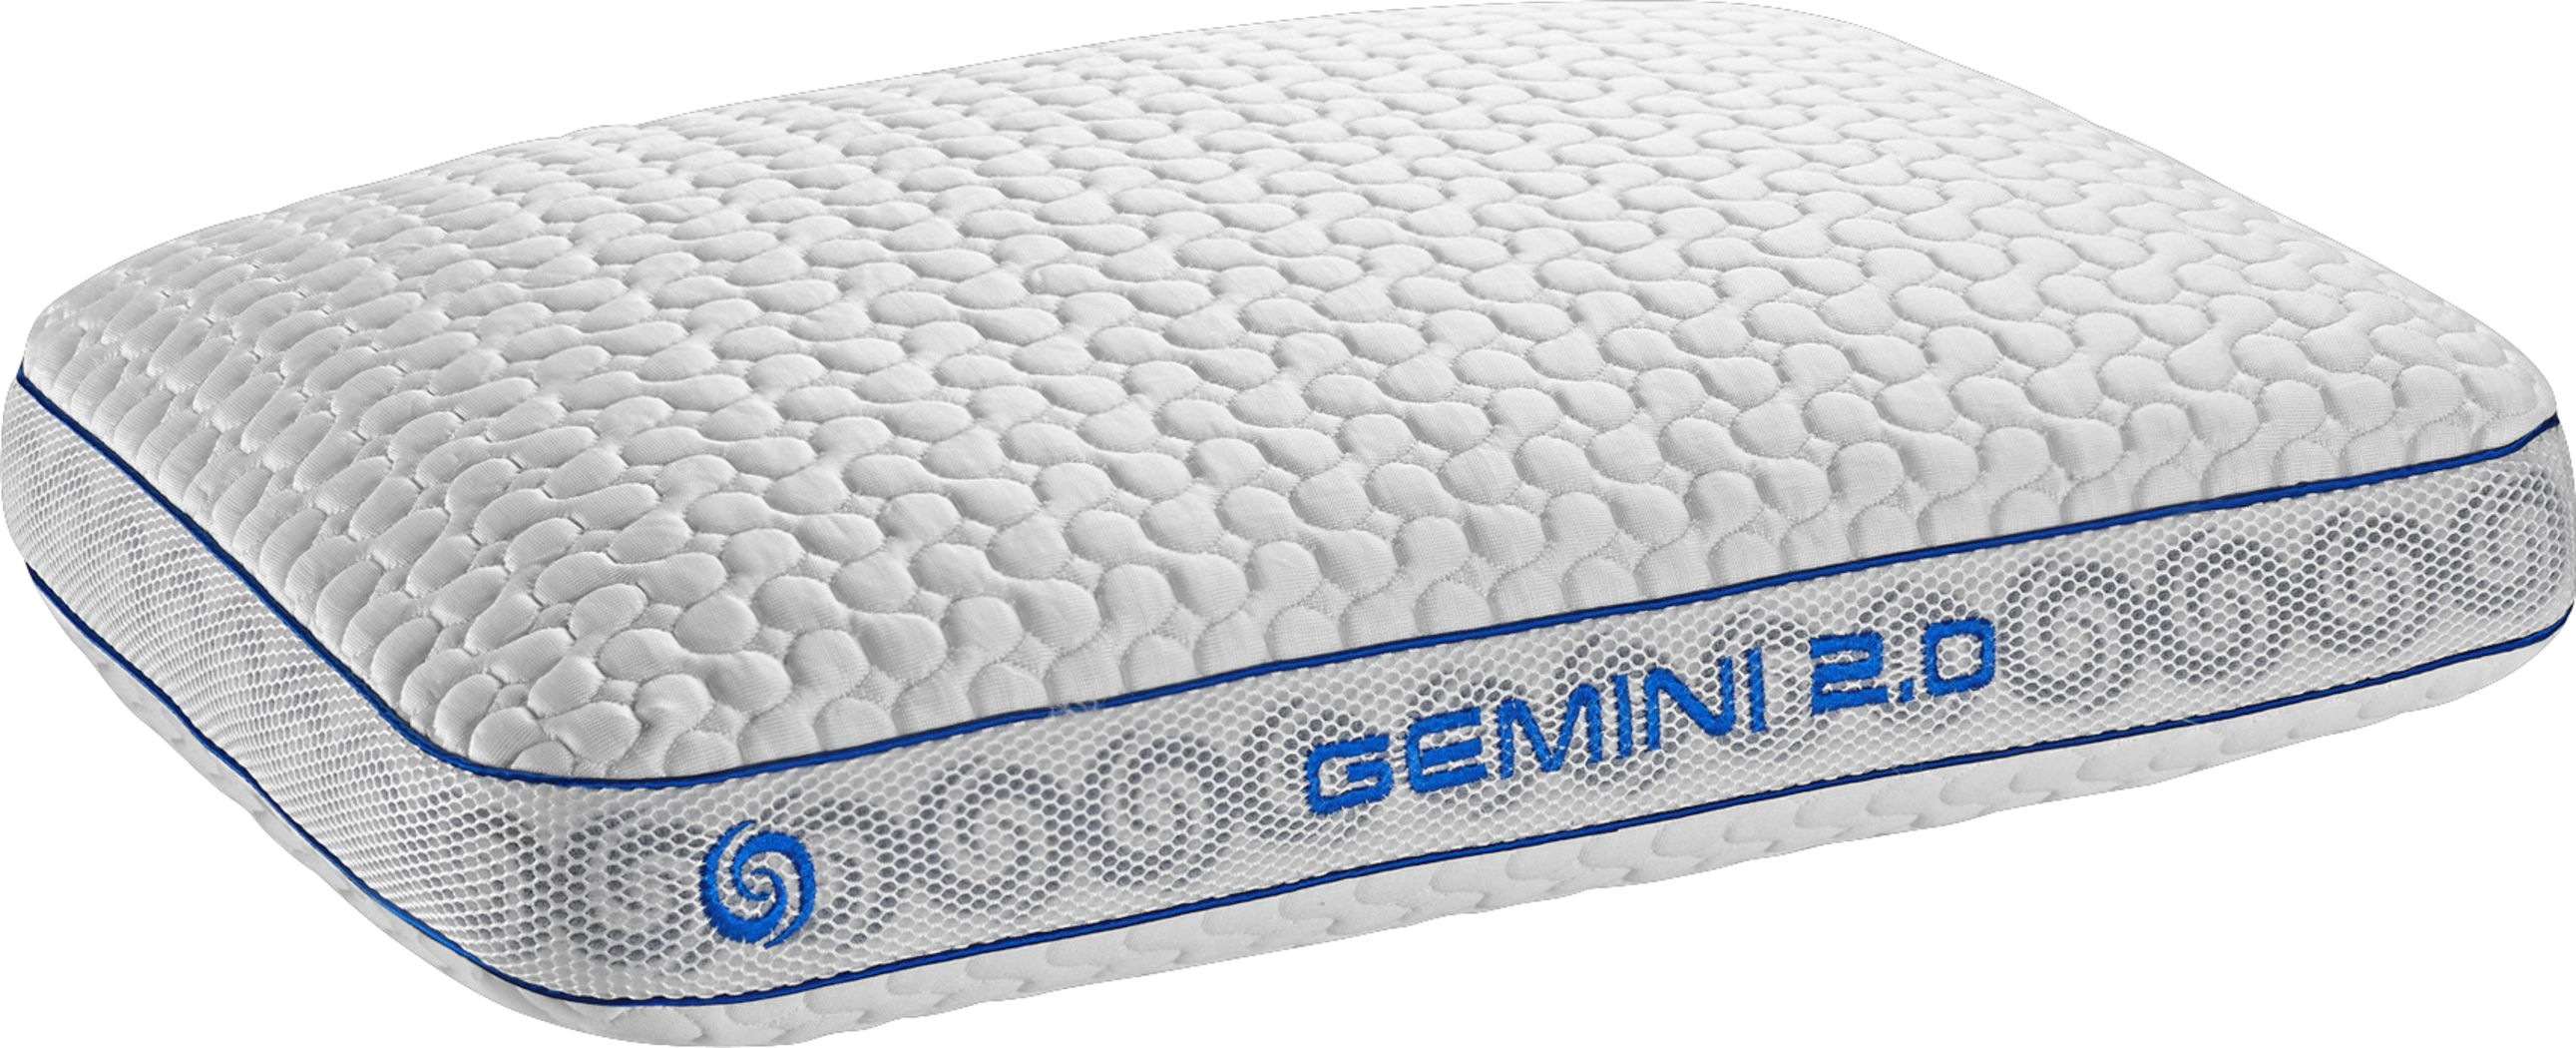 Performance BEDGEAR Gemini 2.0 Pillow